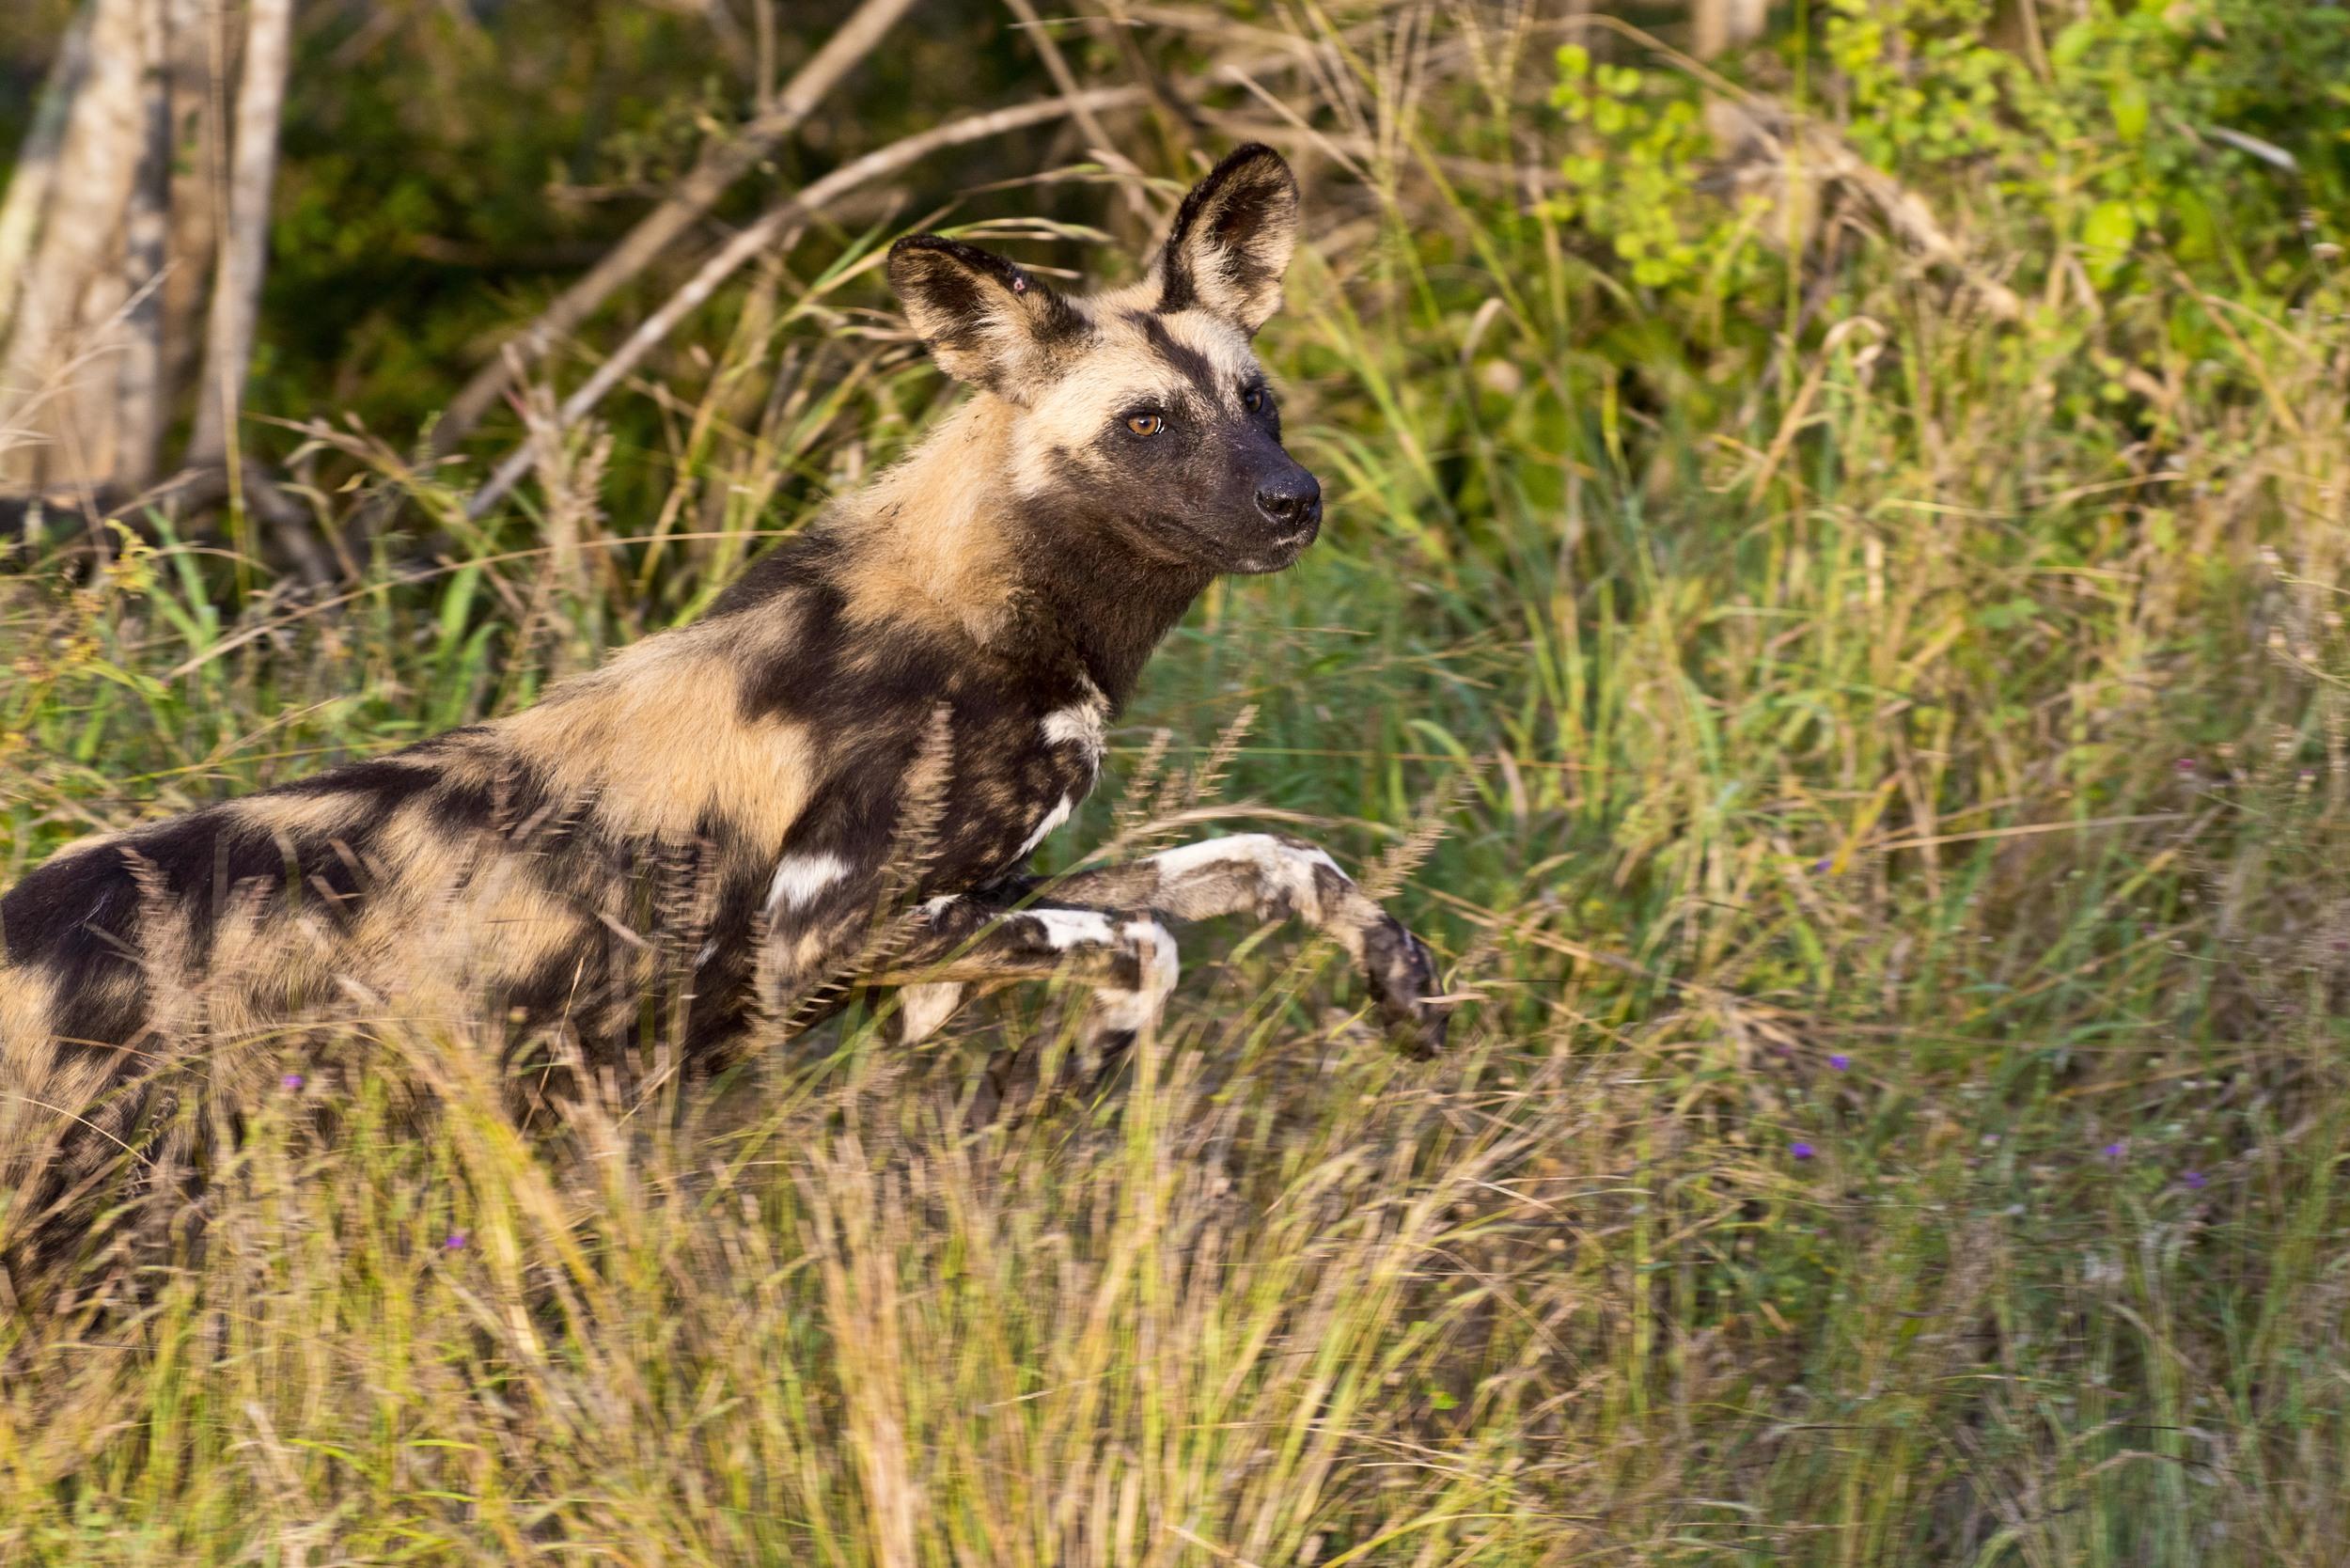 130420_DSC4312 Wild Dog on the Hunt.jpg